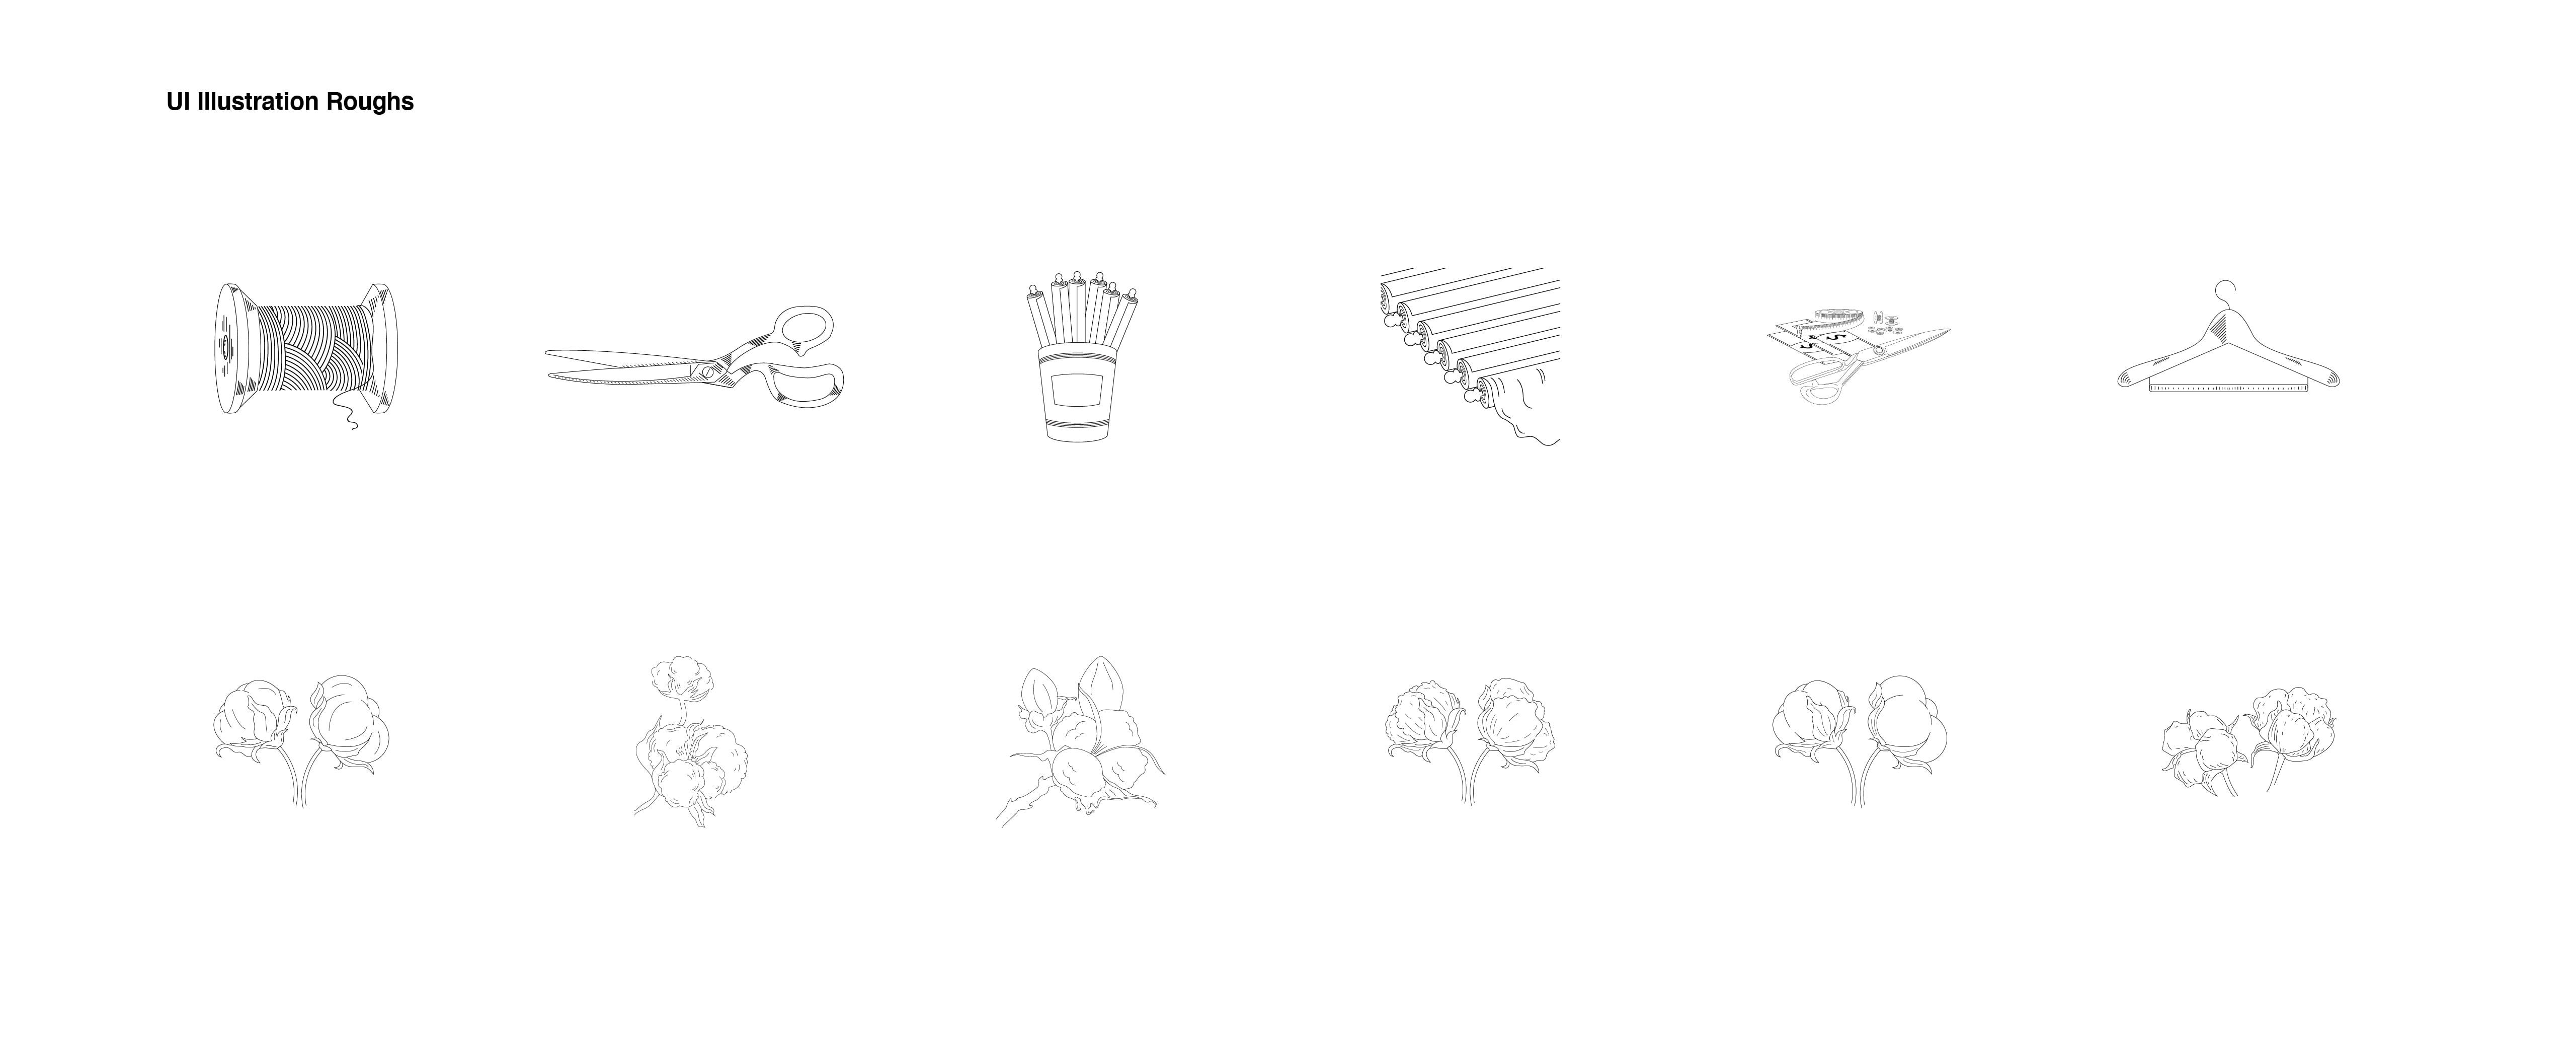 UI Illustrations 04 Marketing@2x-100